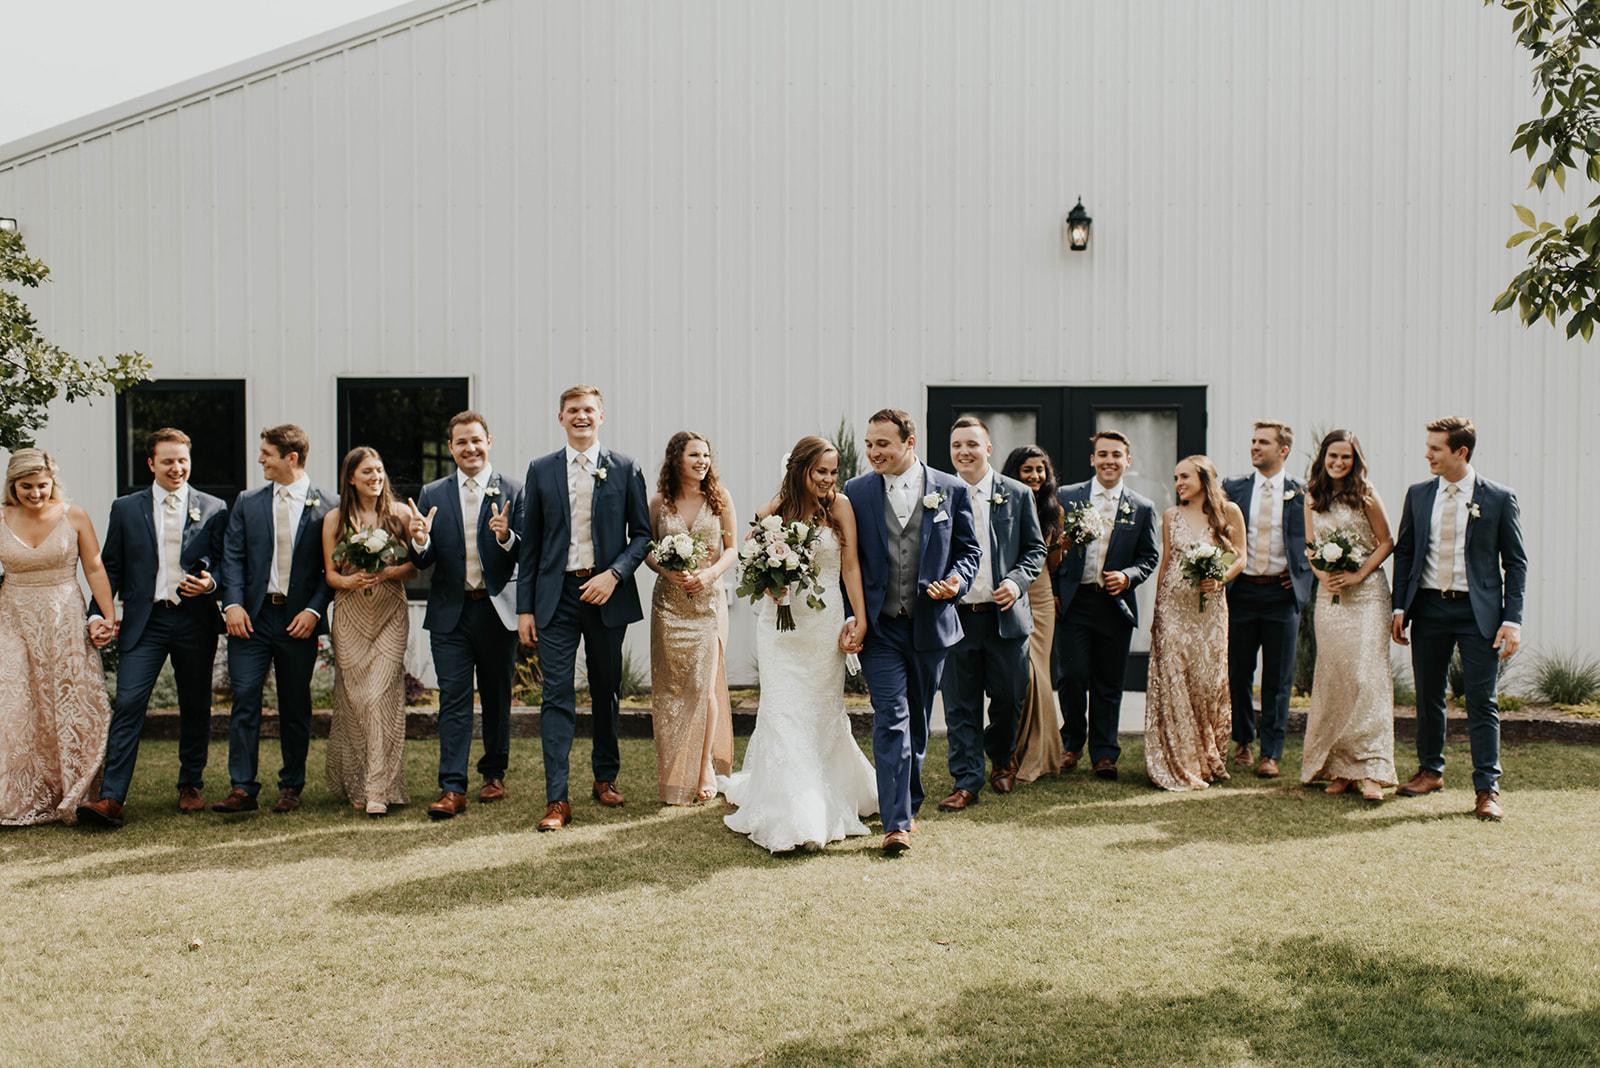 Tulsa Bixby Oklahoma Best Wedding and Reception Venue 48.jpg